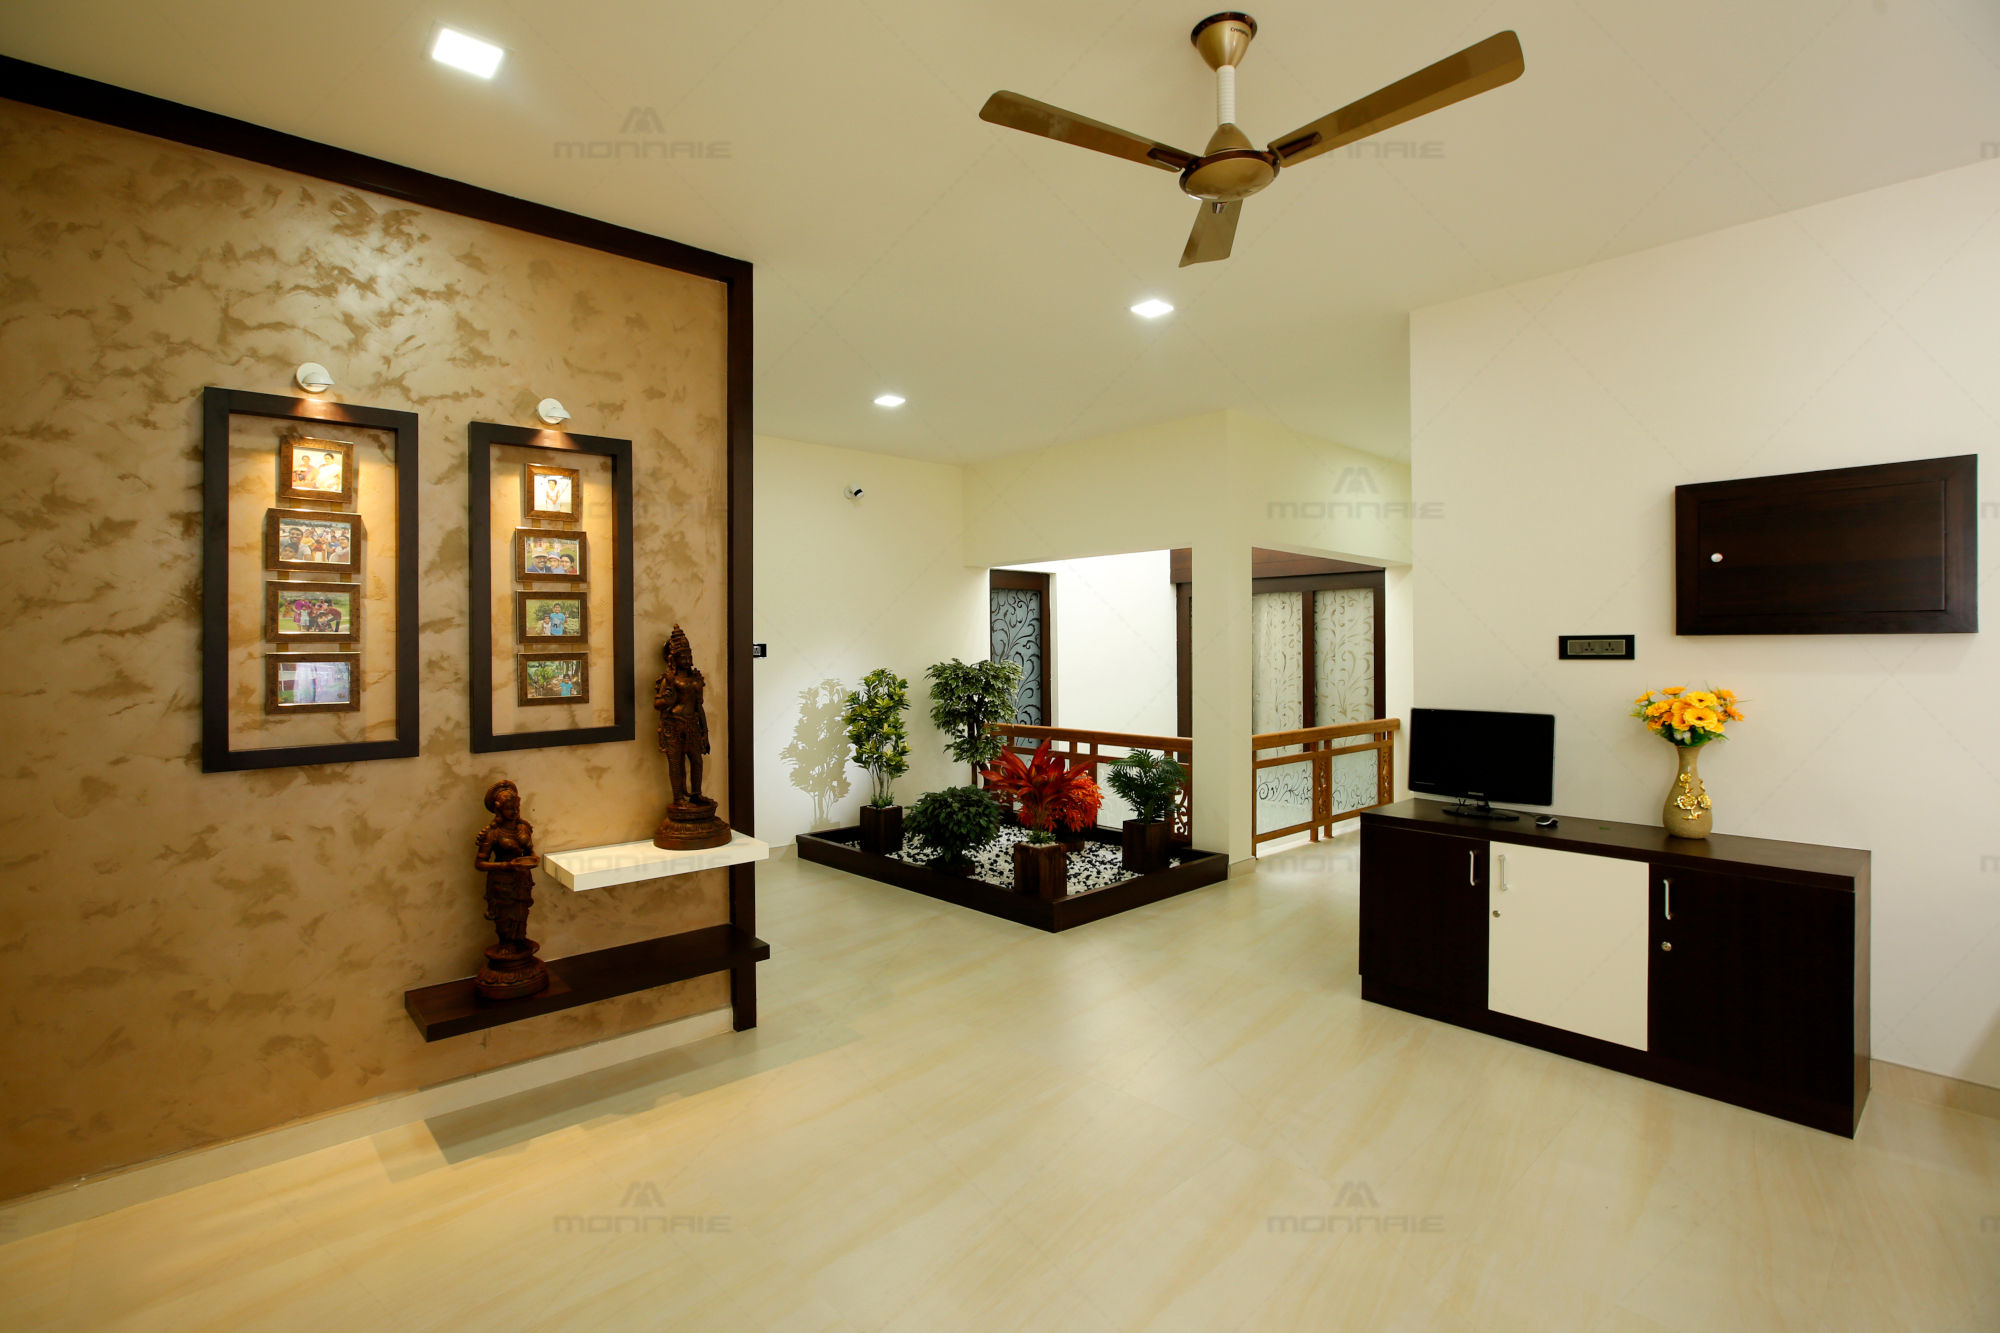 Contemporary Home Interior Designers Kochi Monnaie Architects Interiors Media Photos And Videos 2 Archello